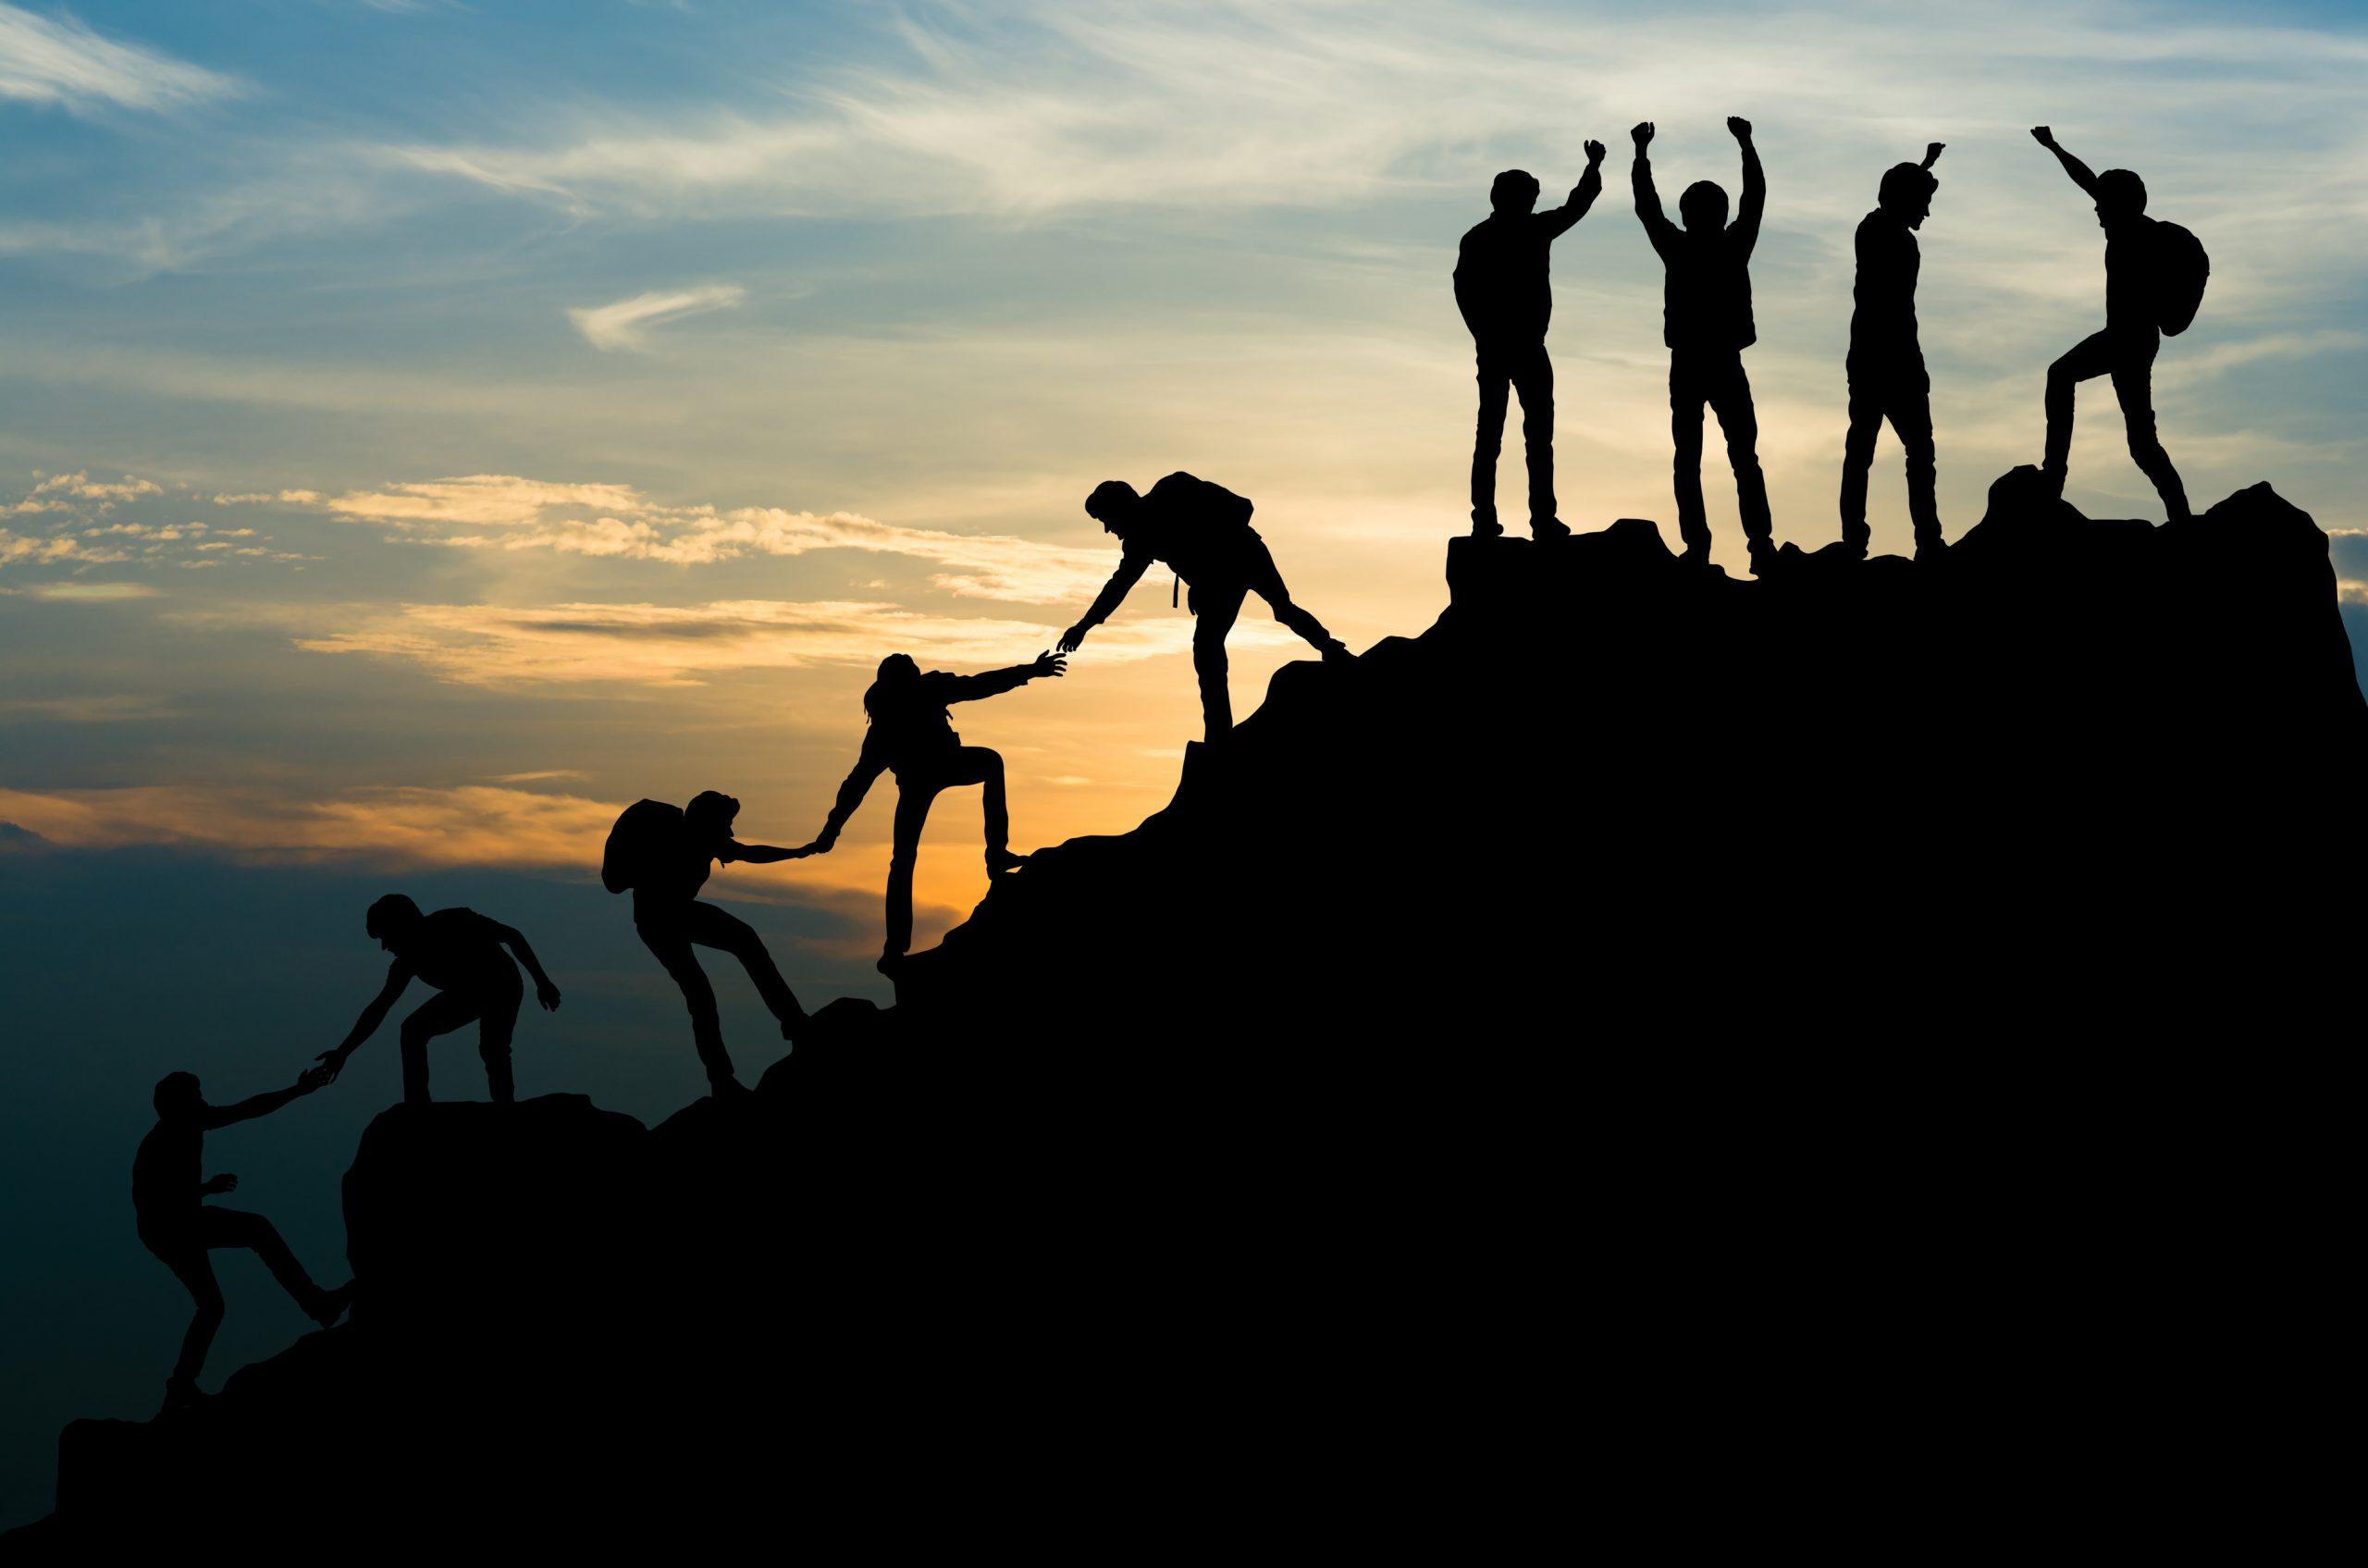 Nos sujets d'accompagnement en gestion de carrière, Human Insight Consulting